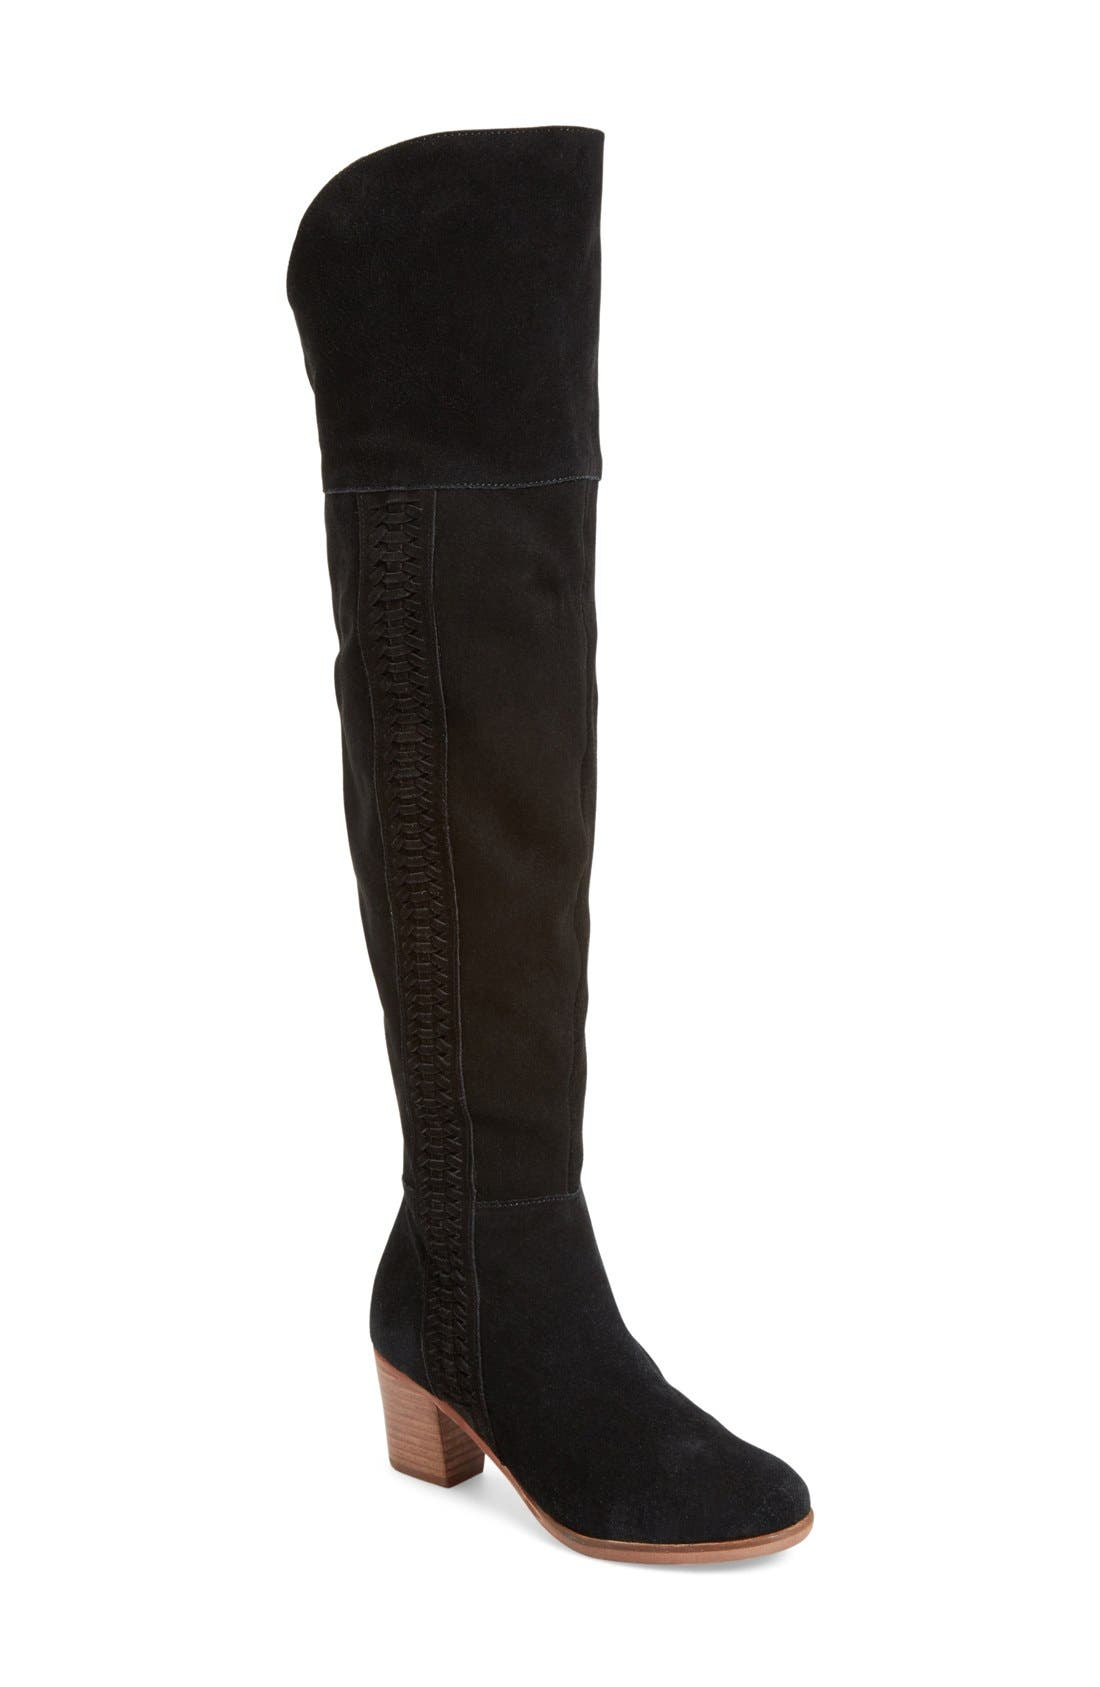 Alternate Image 1 Selected - Matisse Muse Tall Boot (Women) (Narrow Calf)